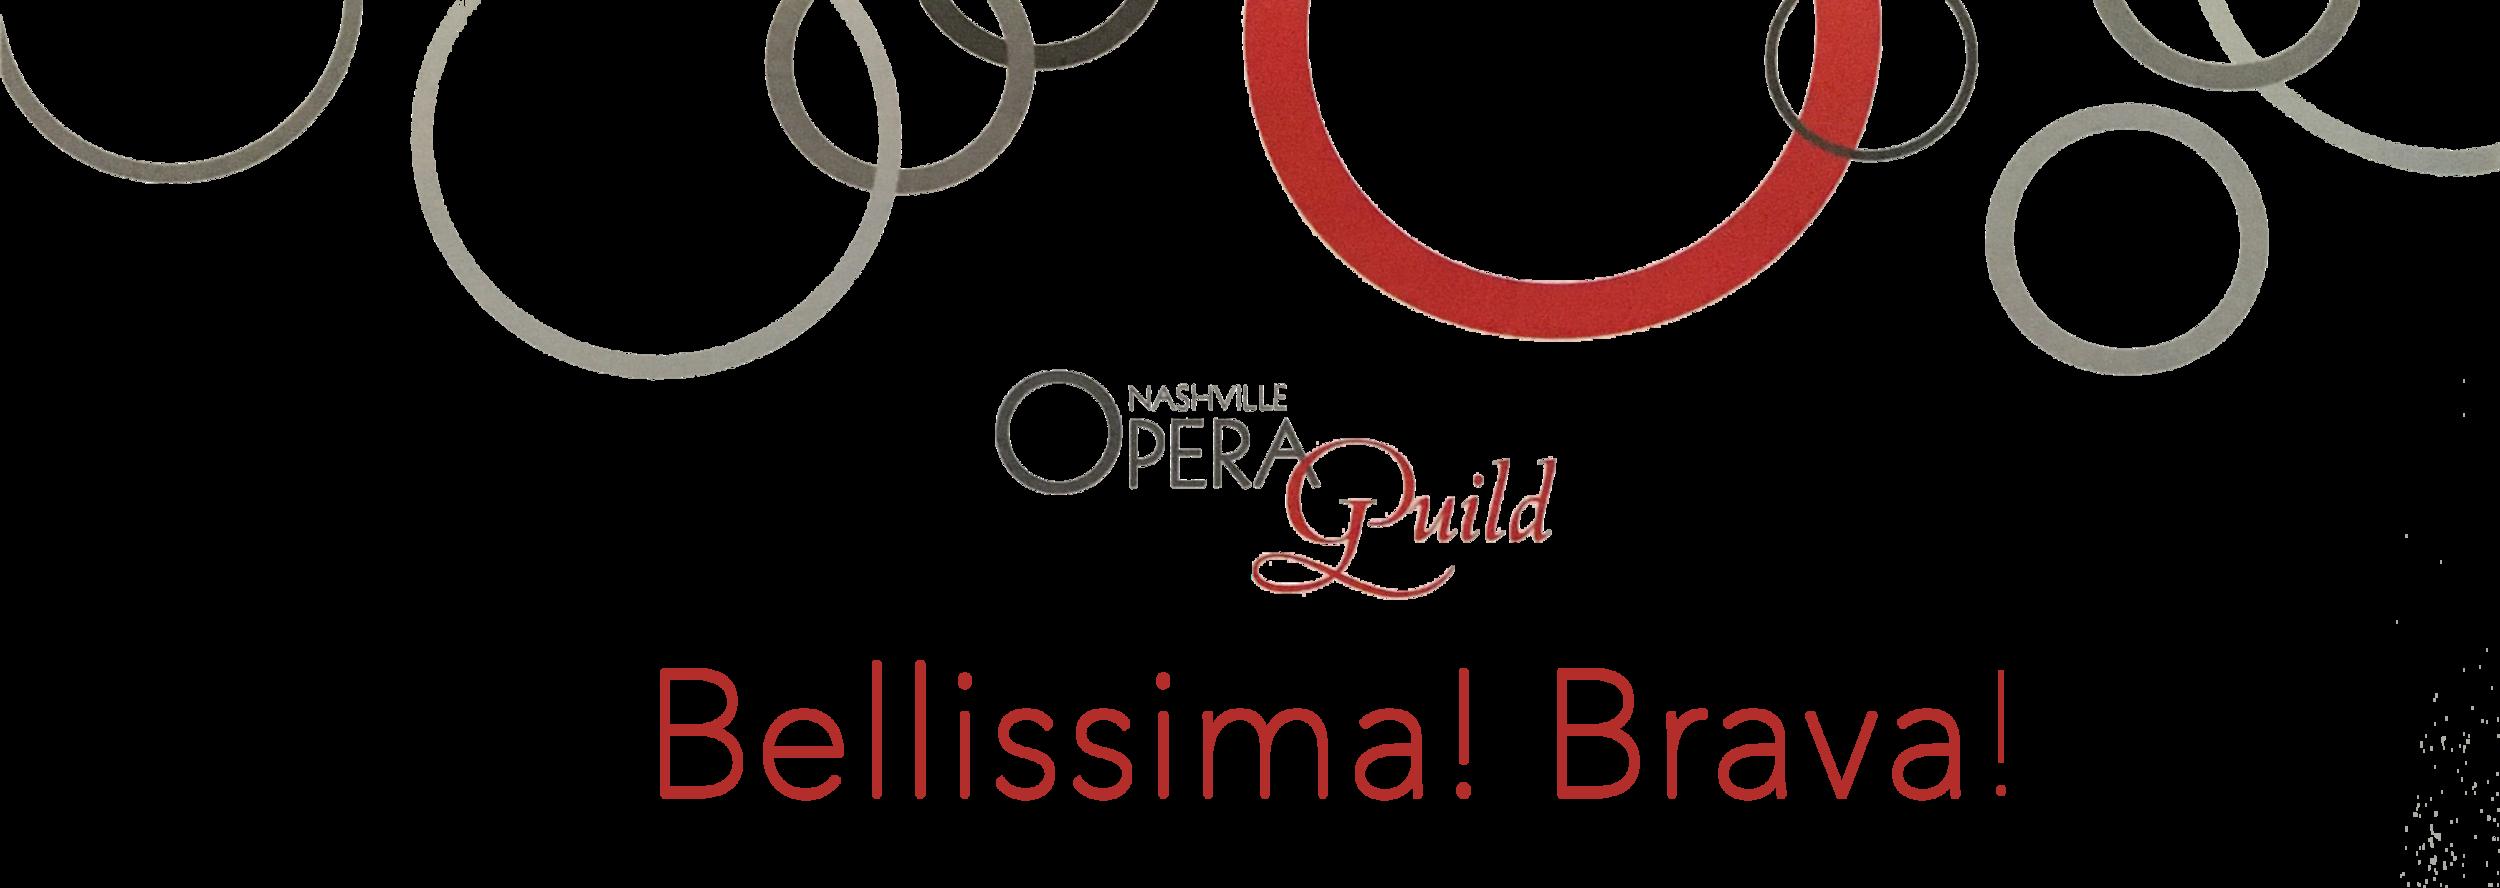 Bellissima_Brava.png